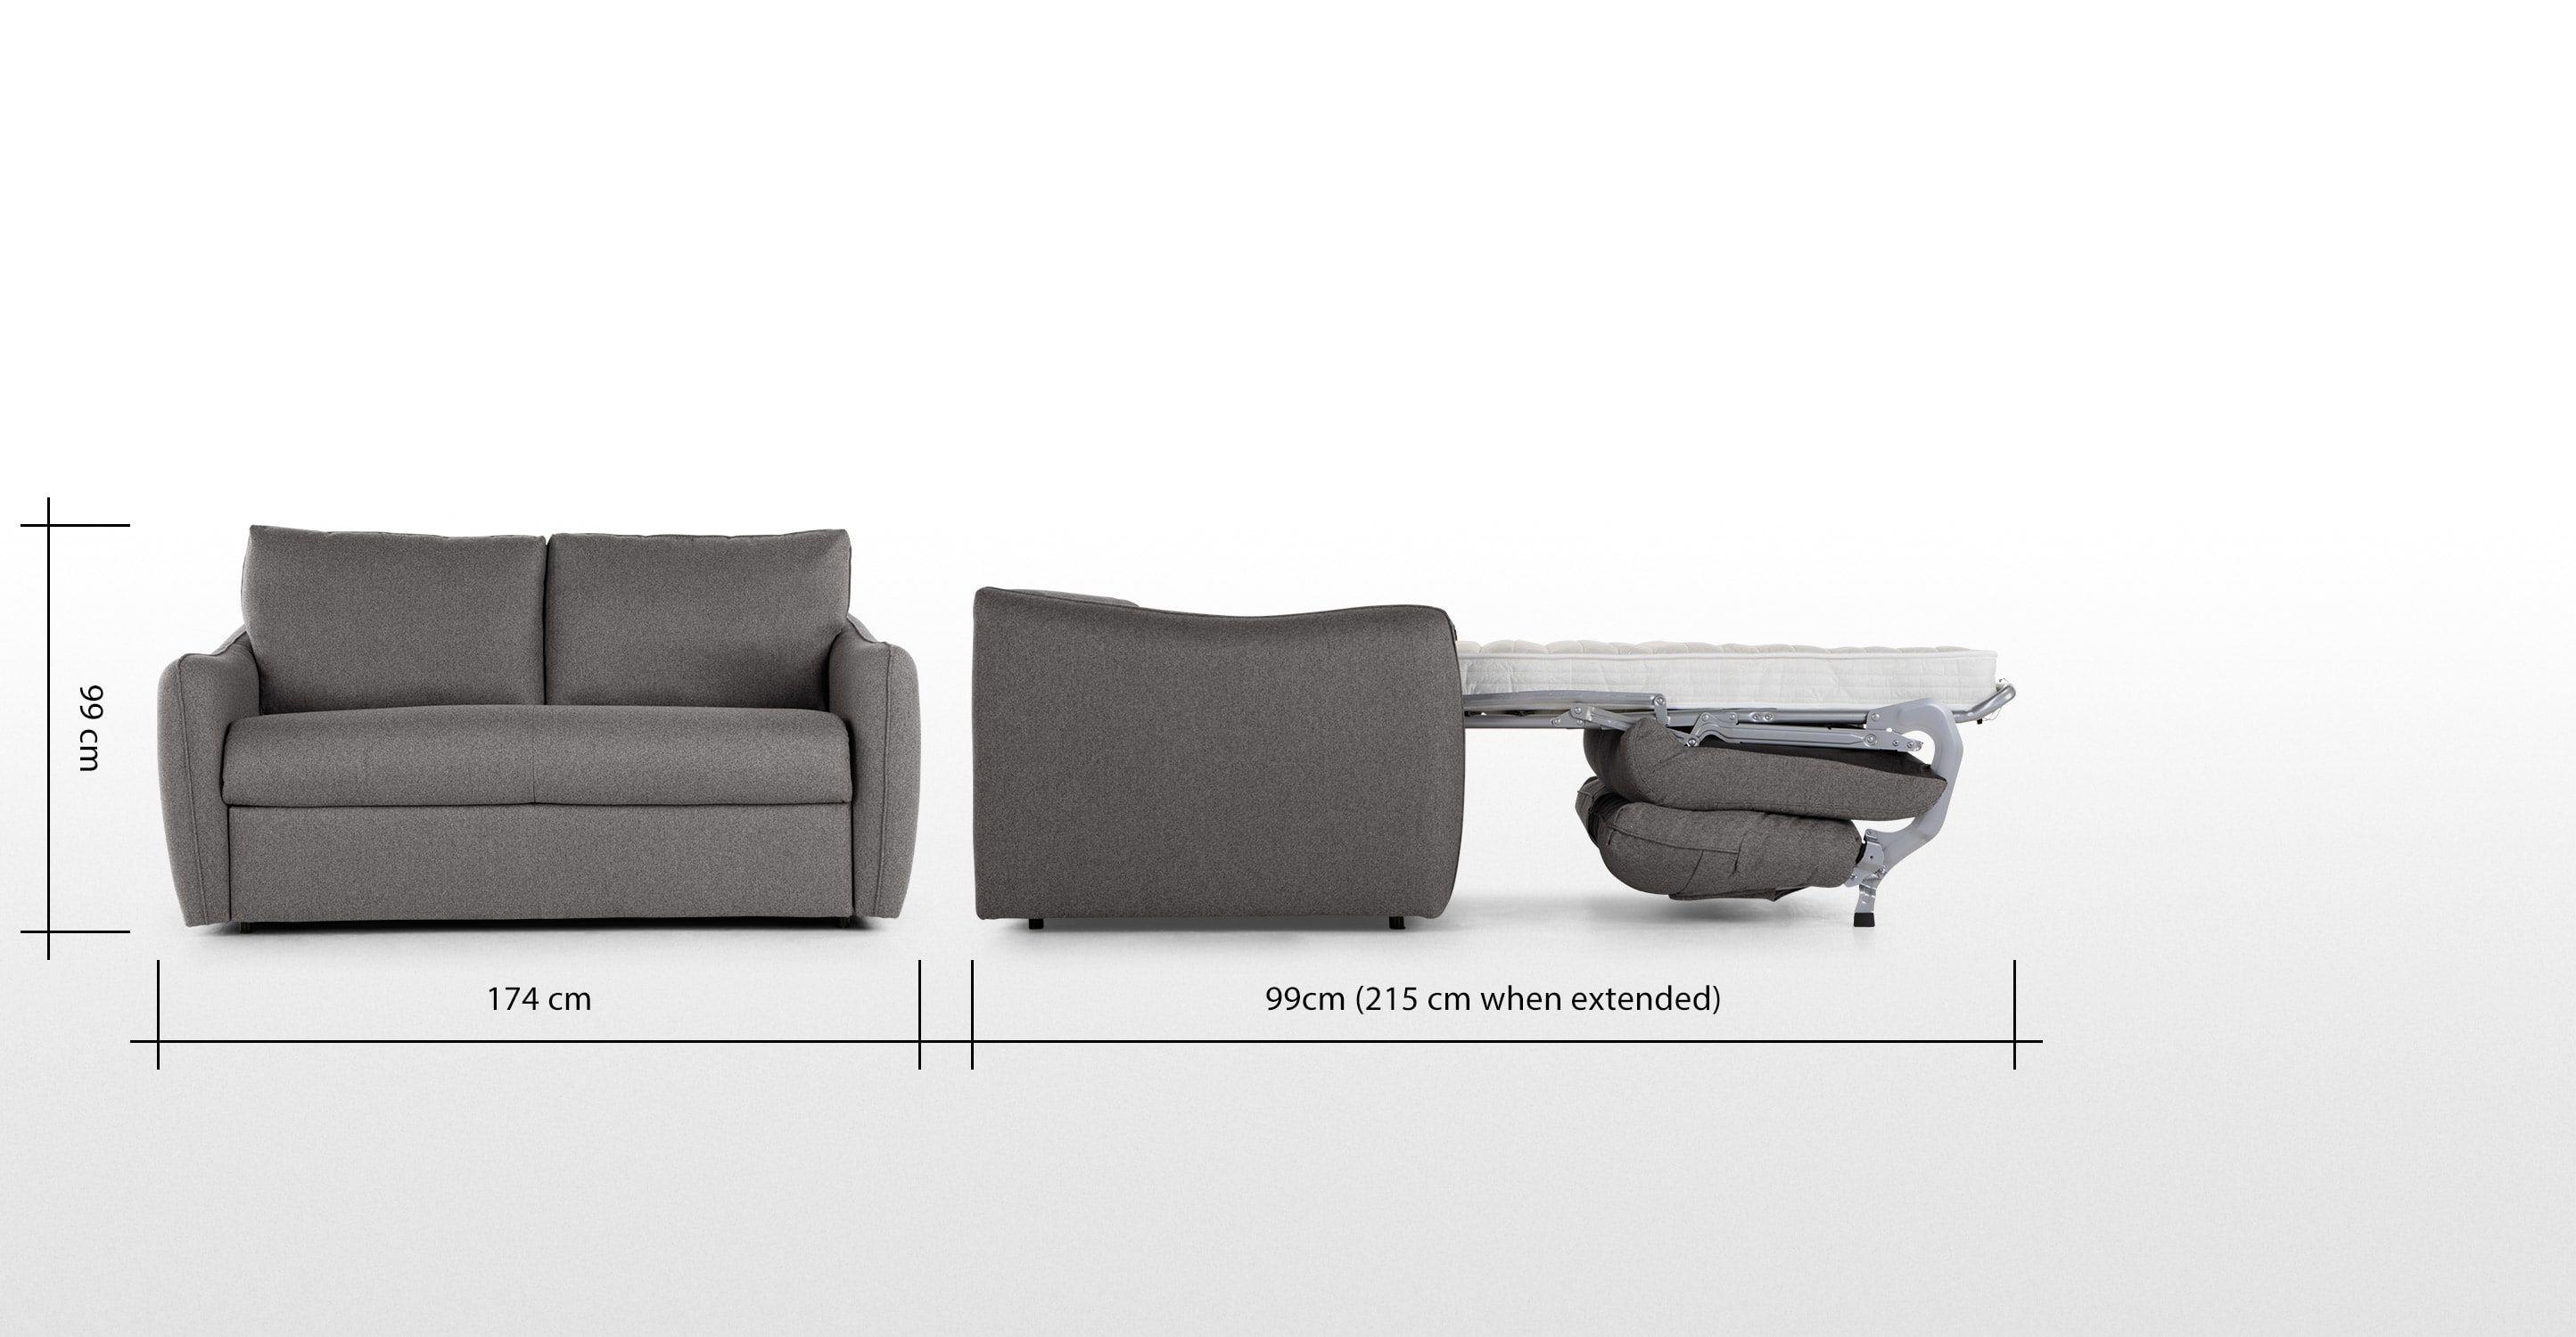 Jefferson Sofa Bed Tweed Grey Made